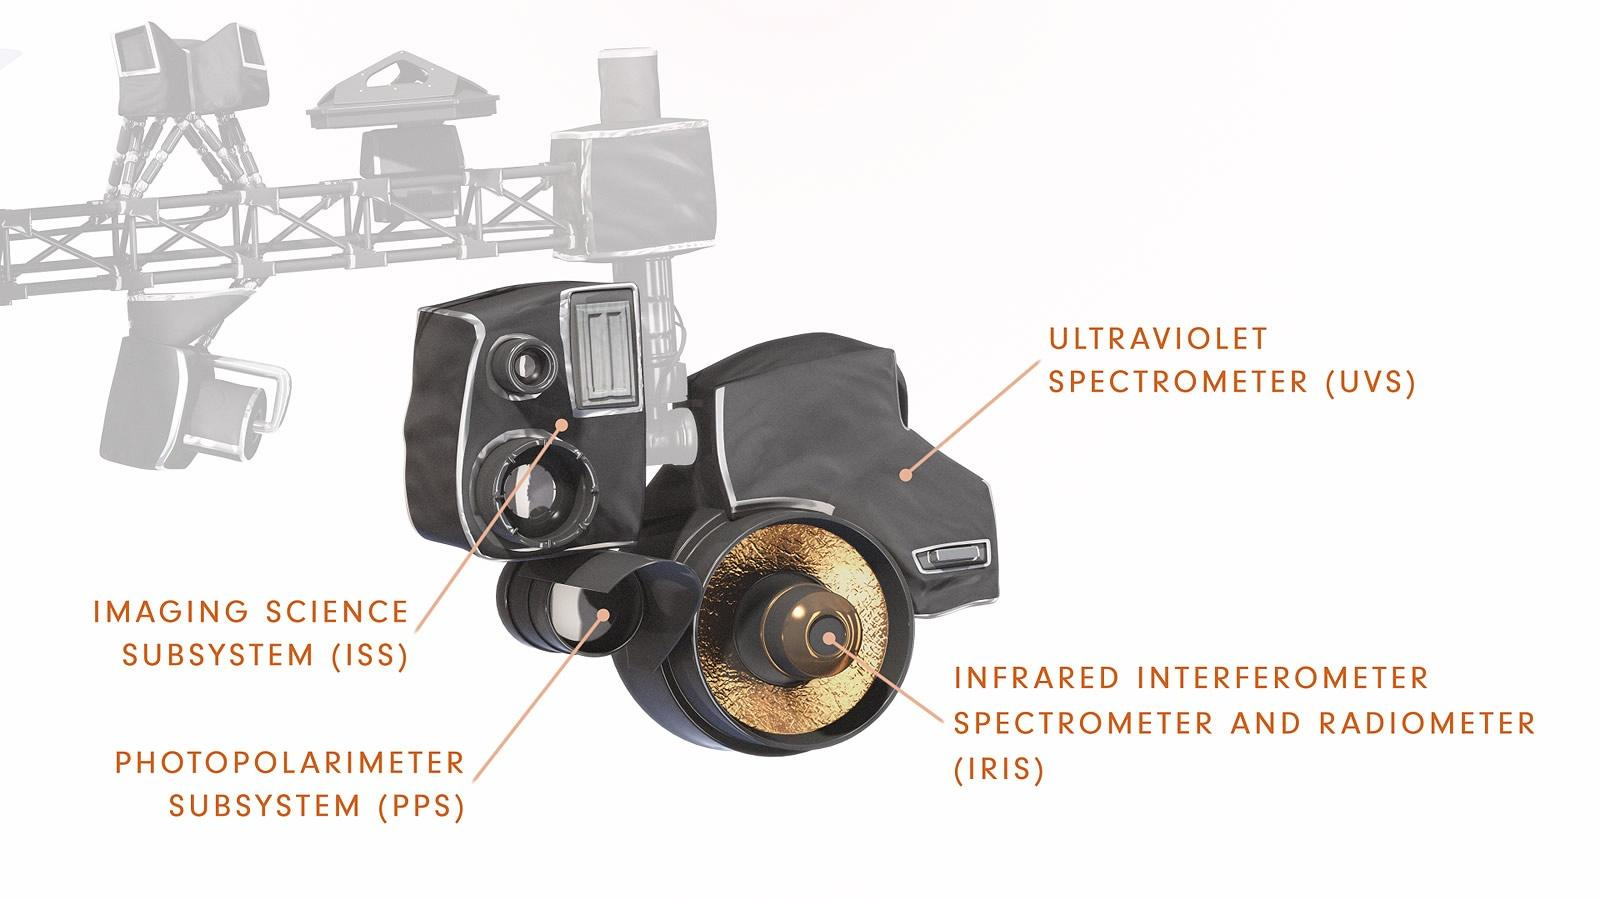 Diagram of Voyager moveable scan platform